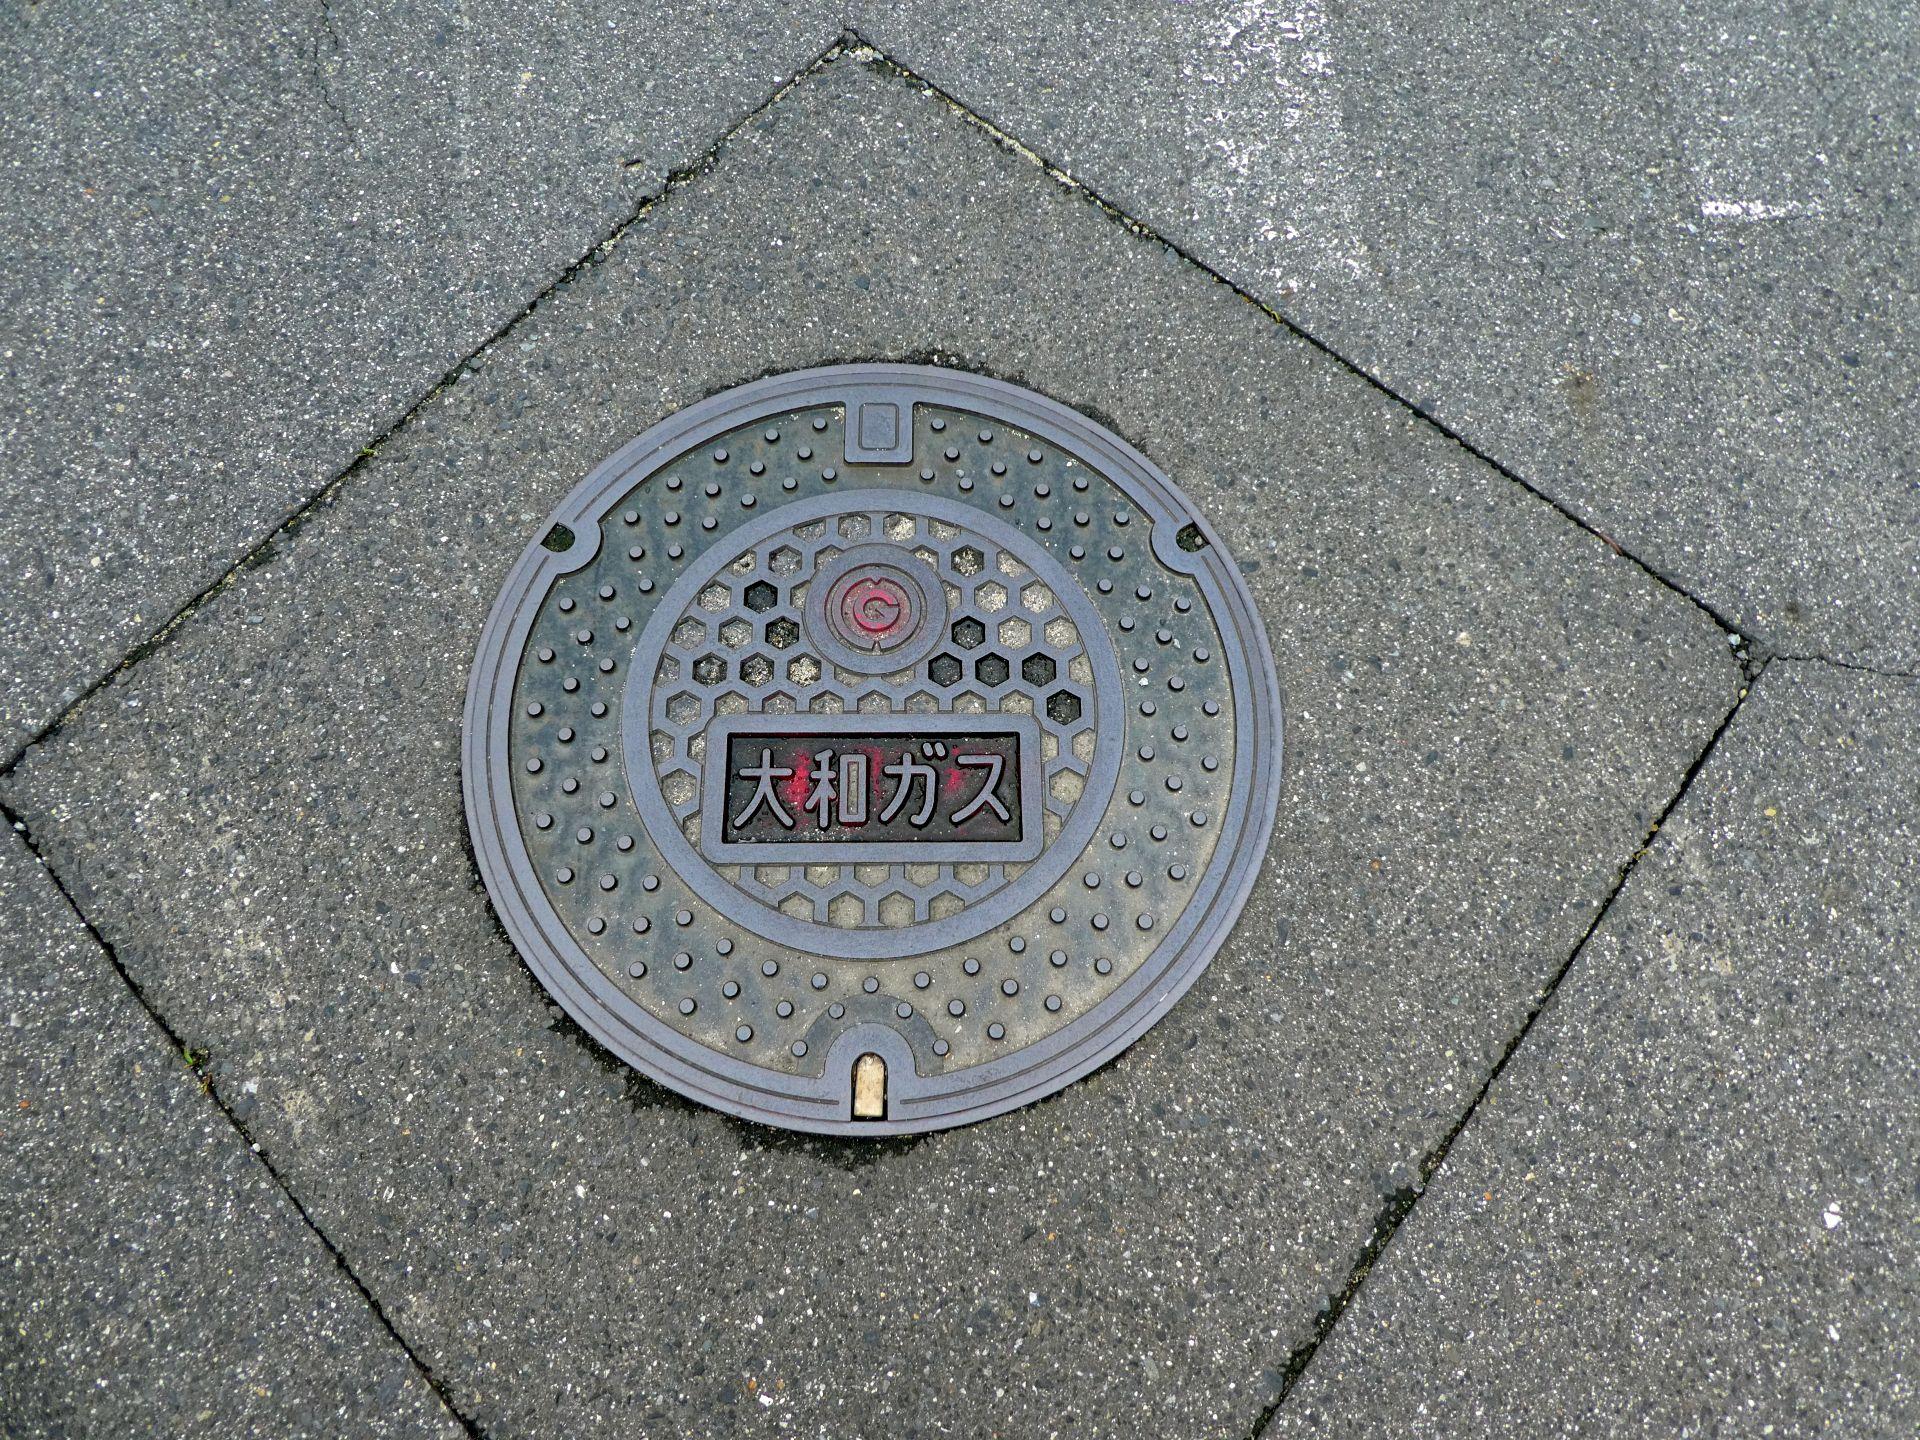 Manhole in Kashihara city